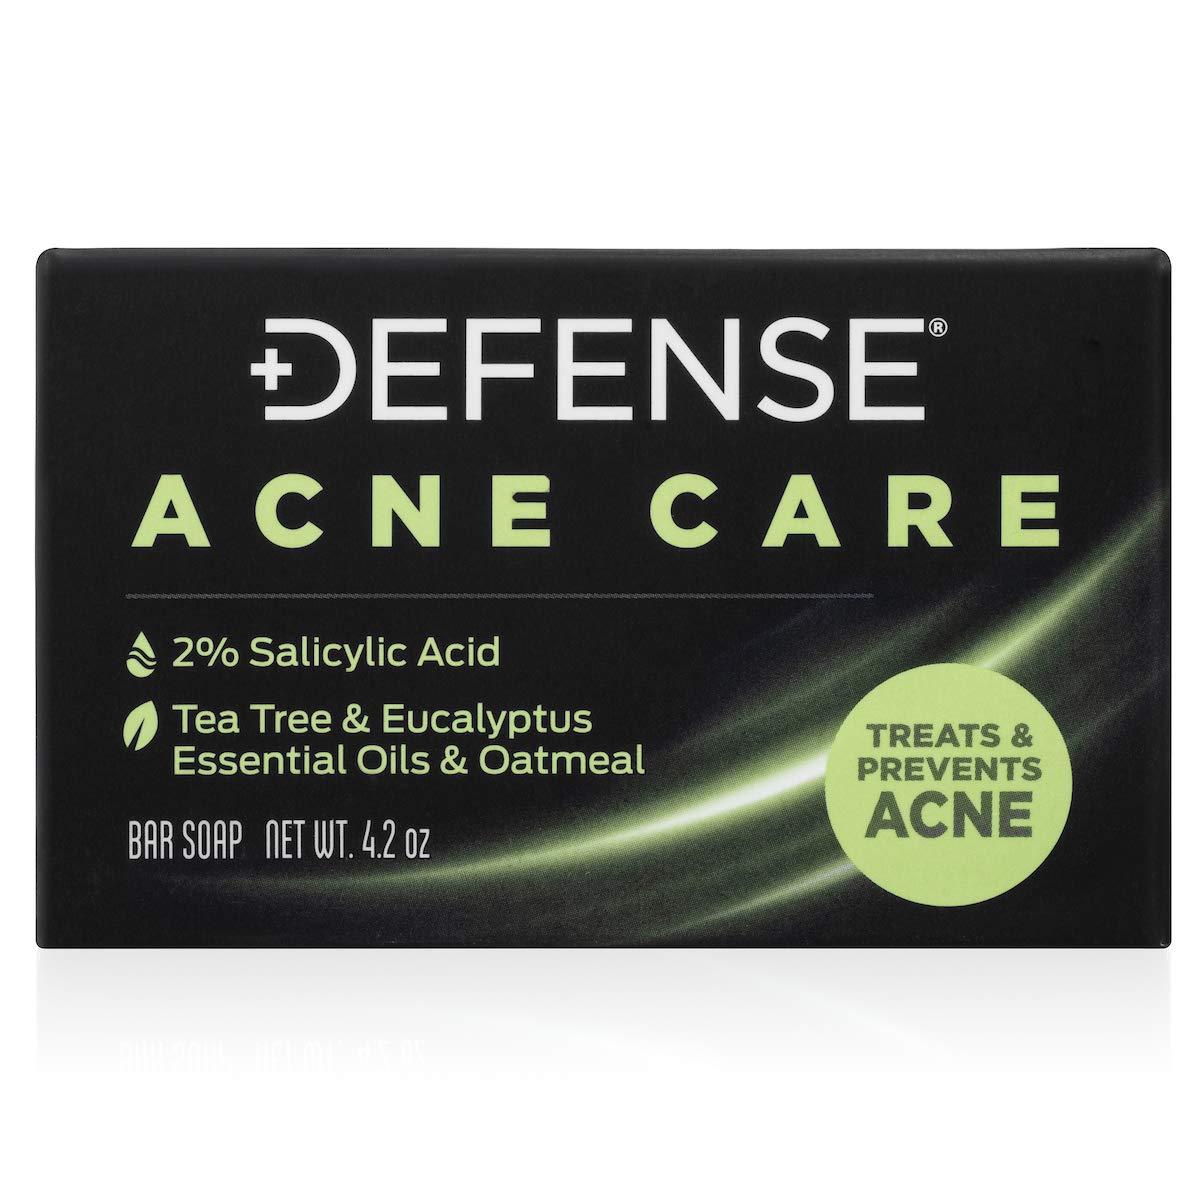 Defense Acne Care Bar Soap 4.2oz : Beauty